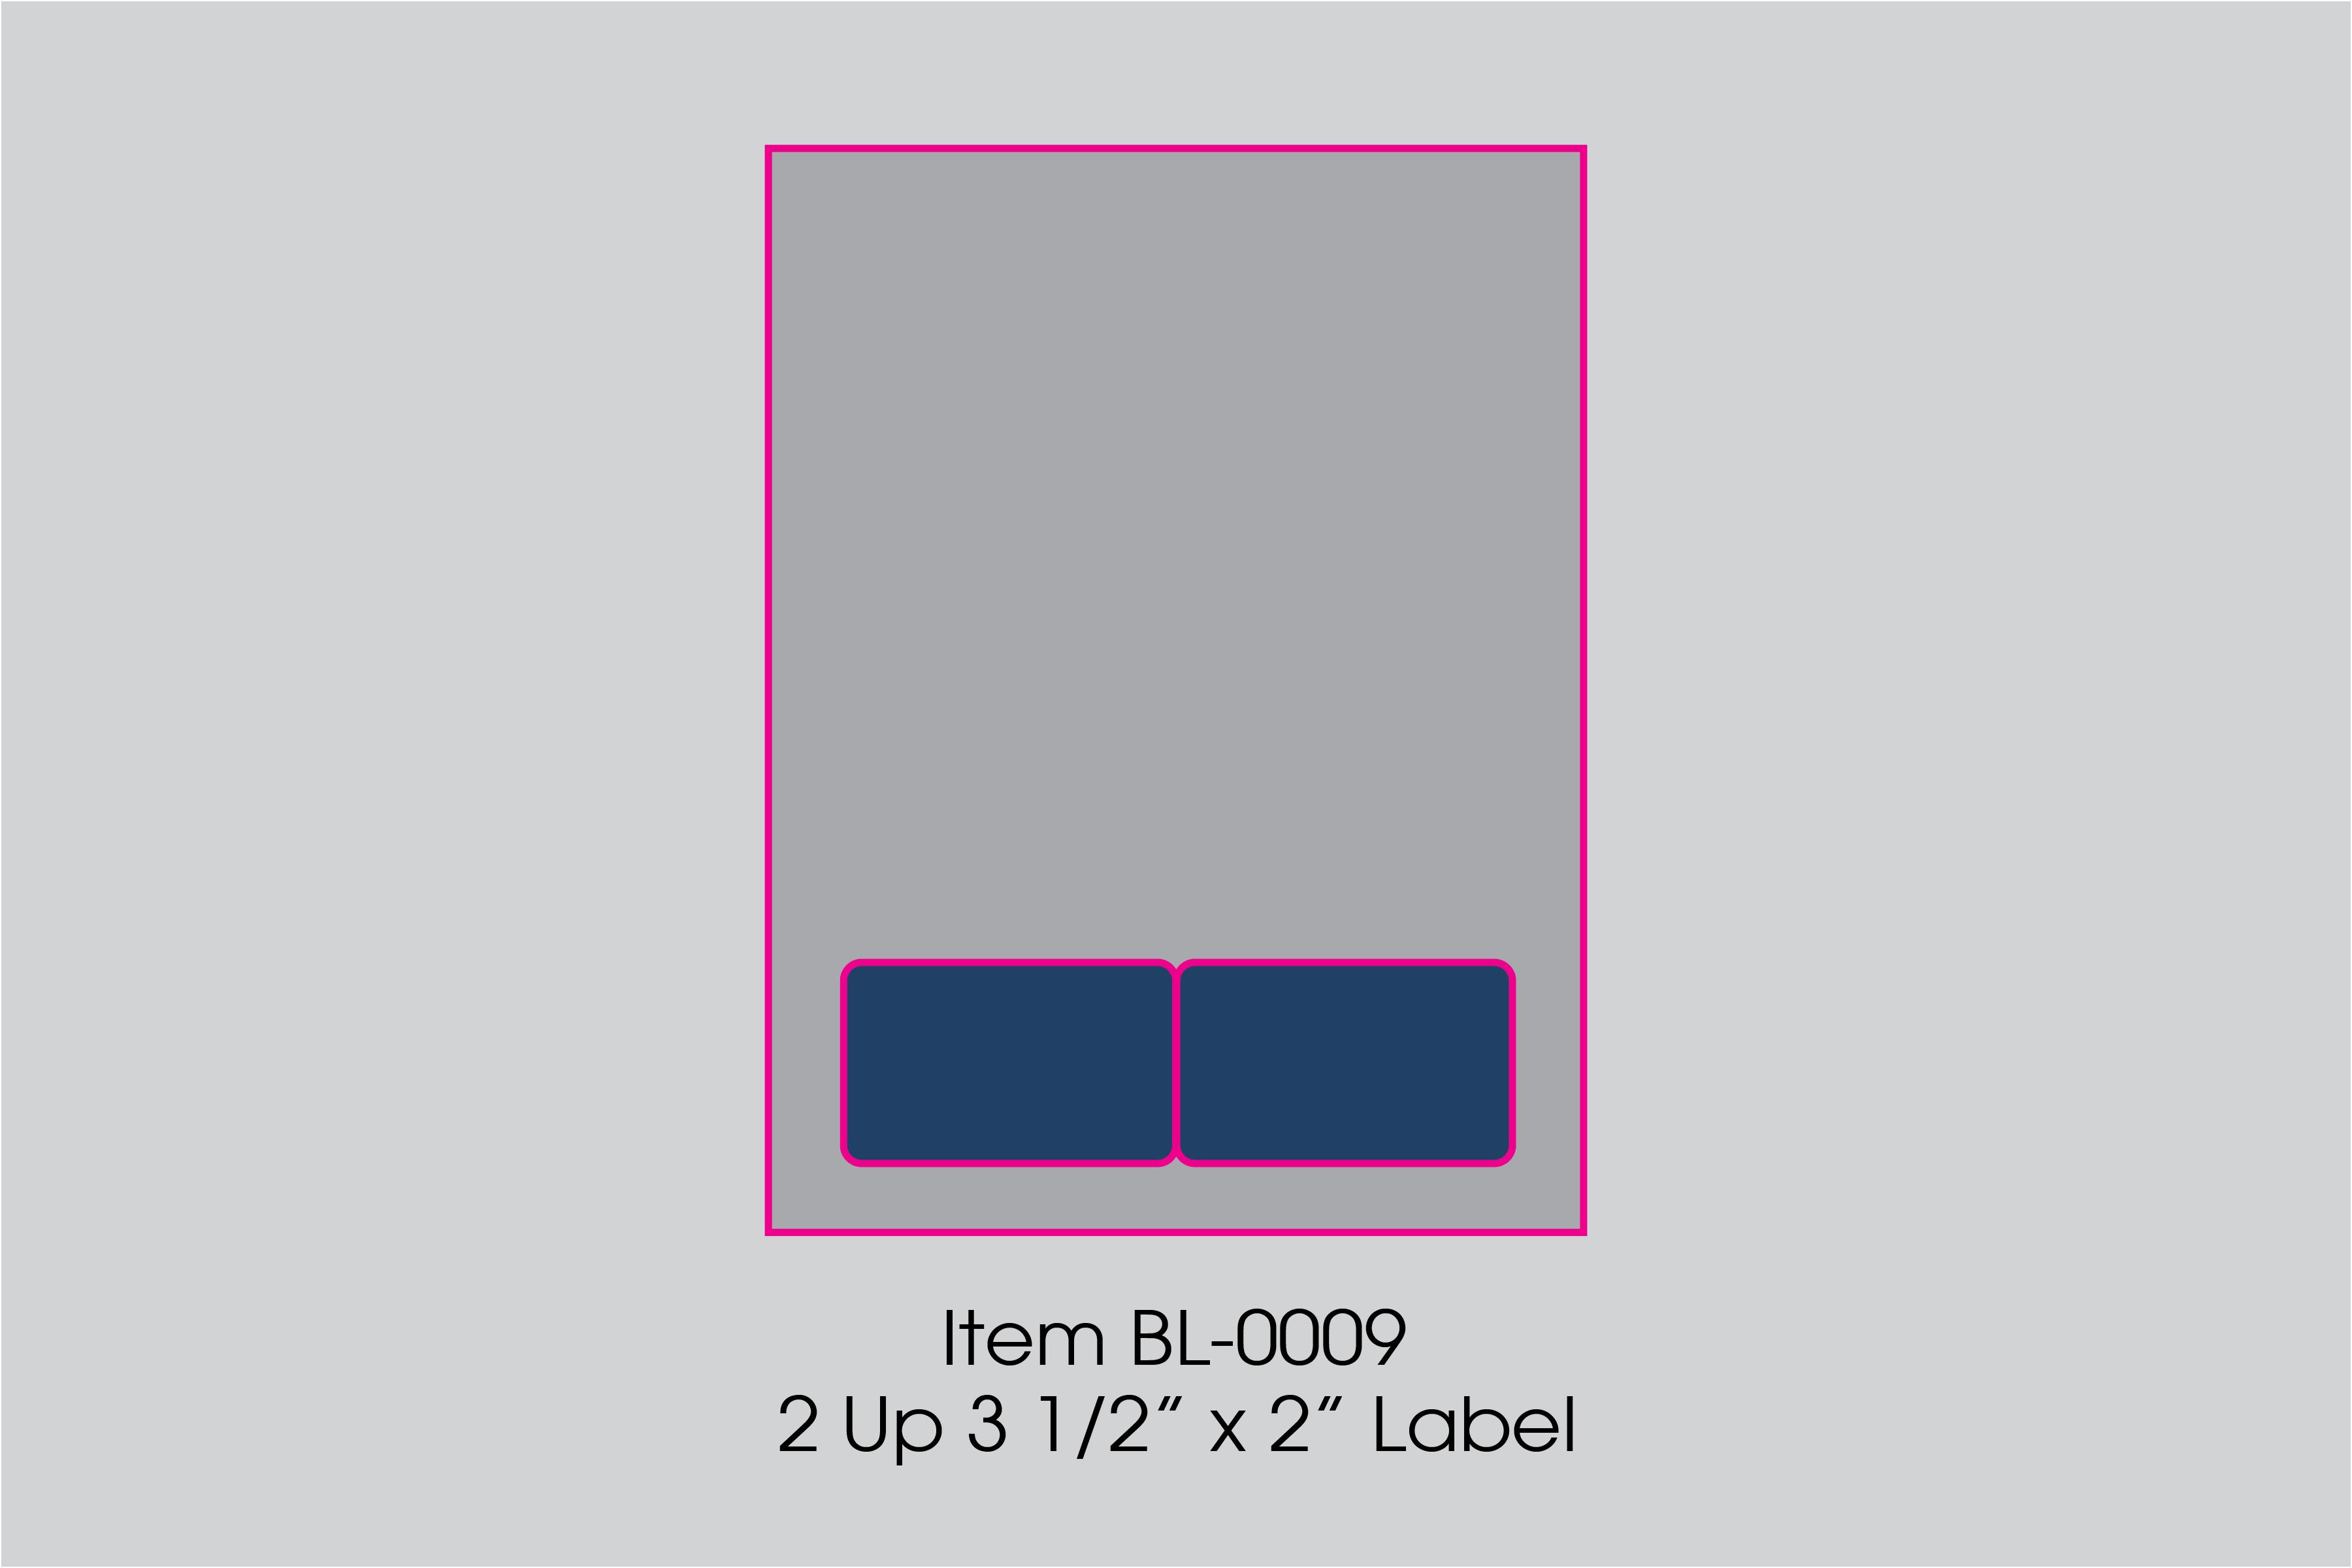 BL-0009